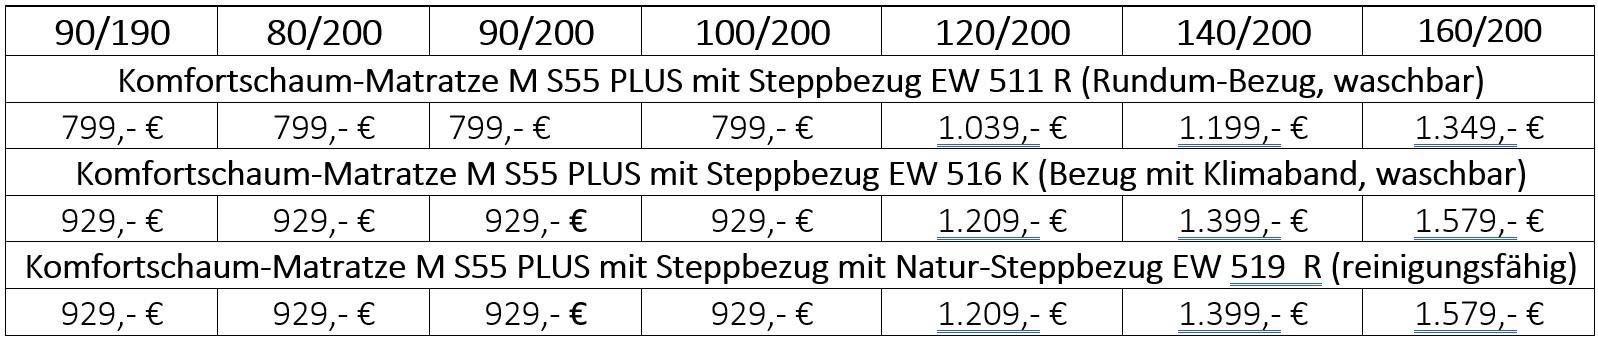 Werkmeister S55 Plus Preistabelle